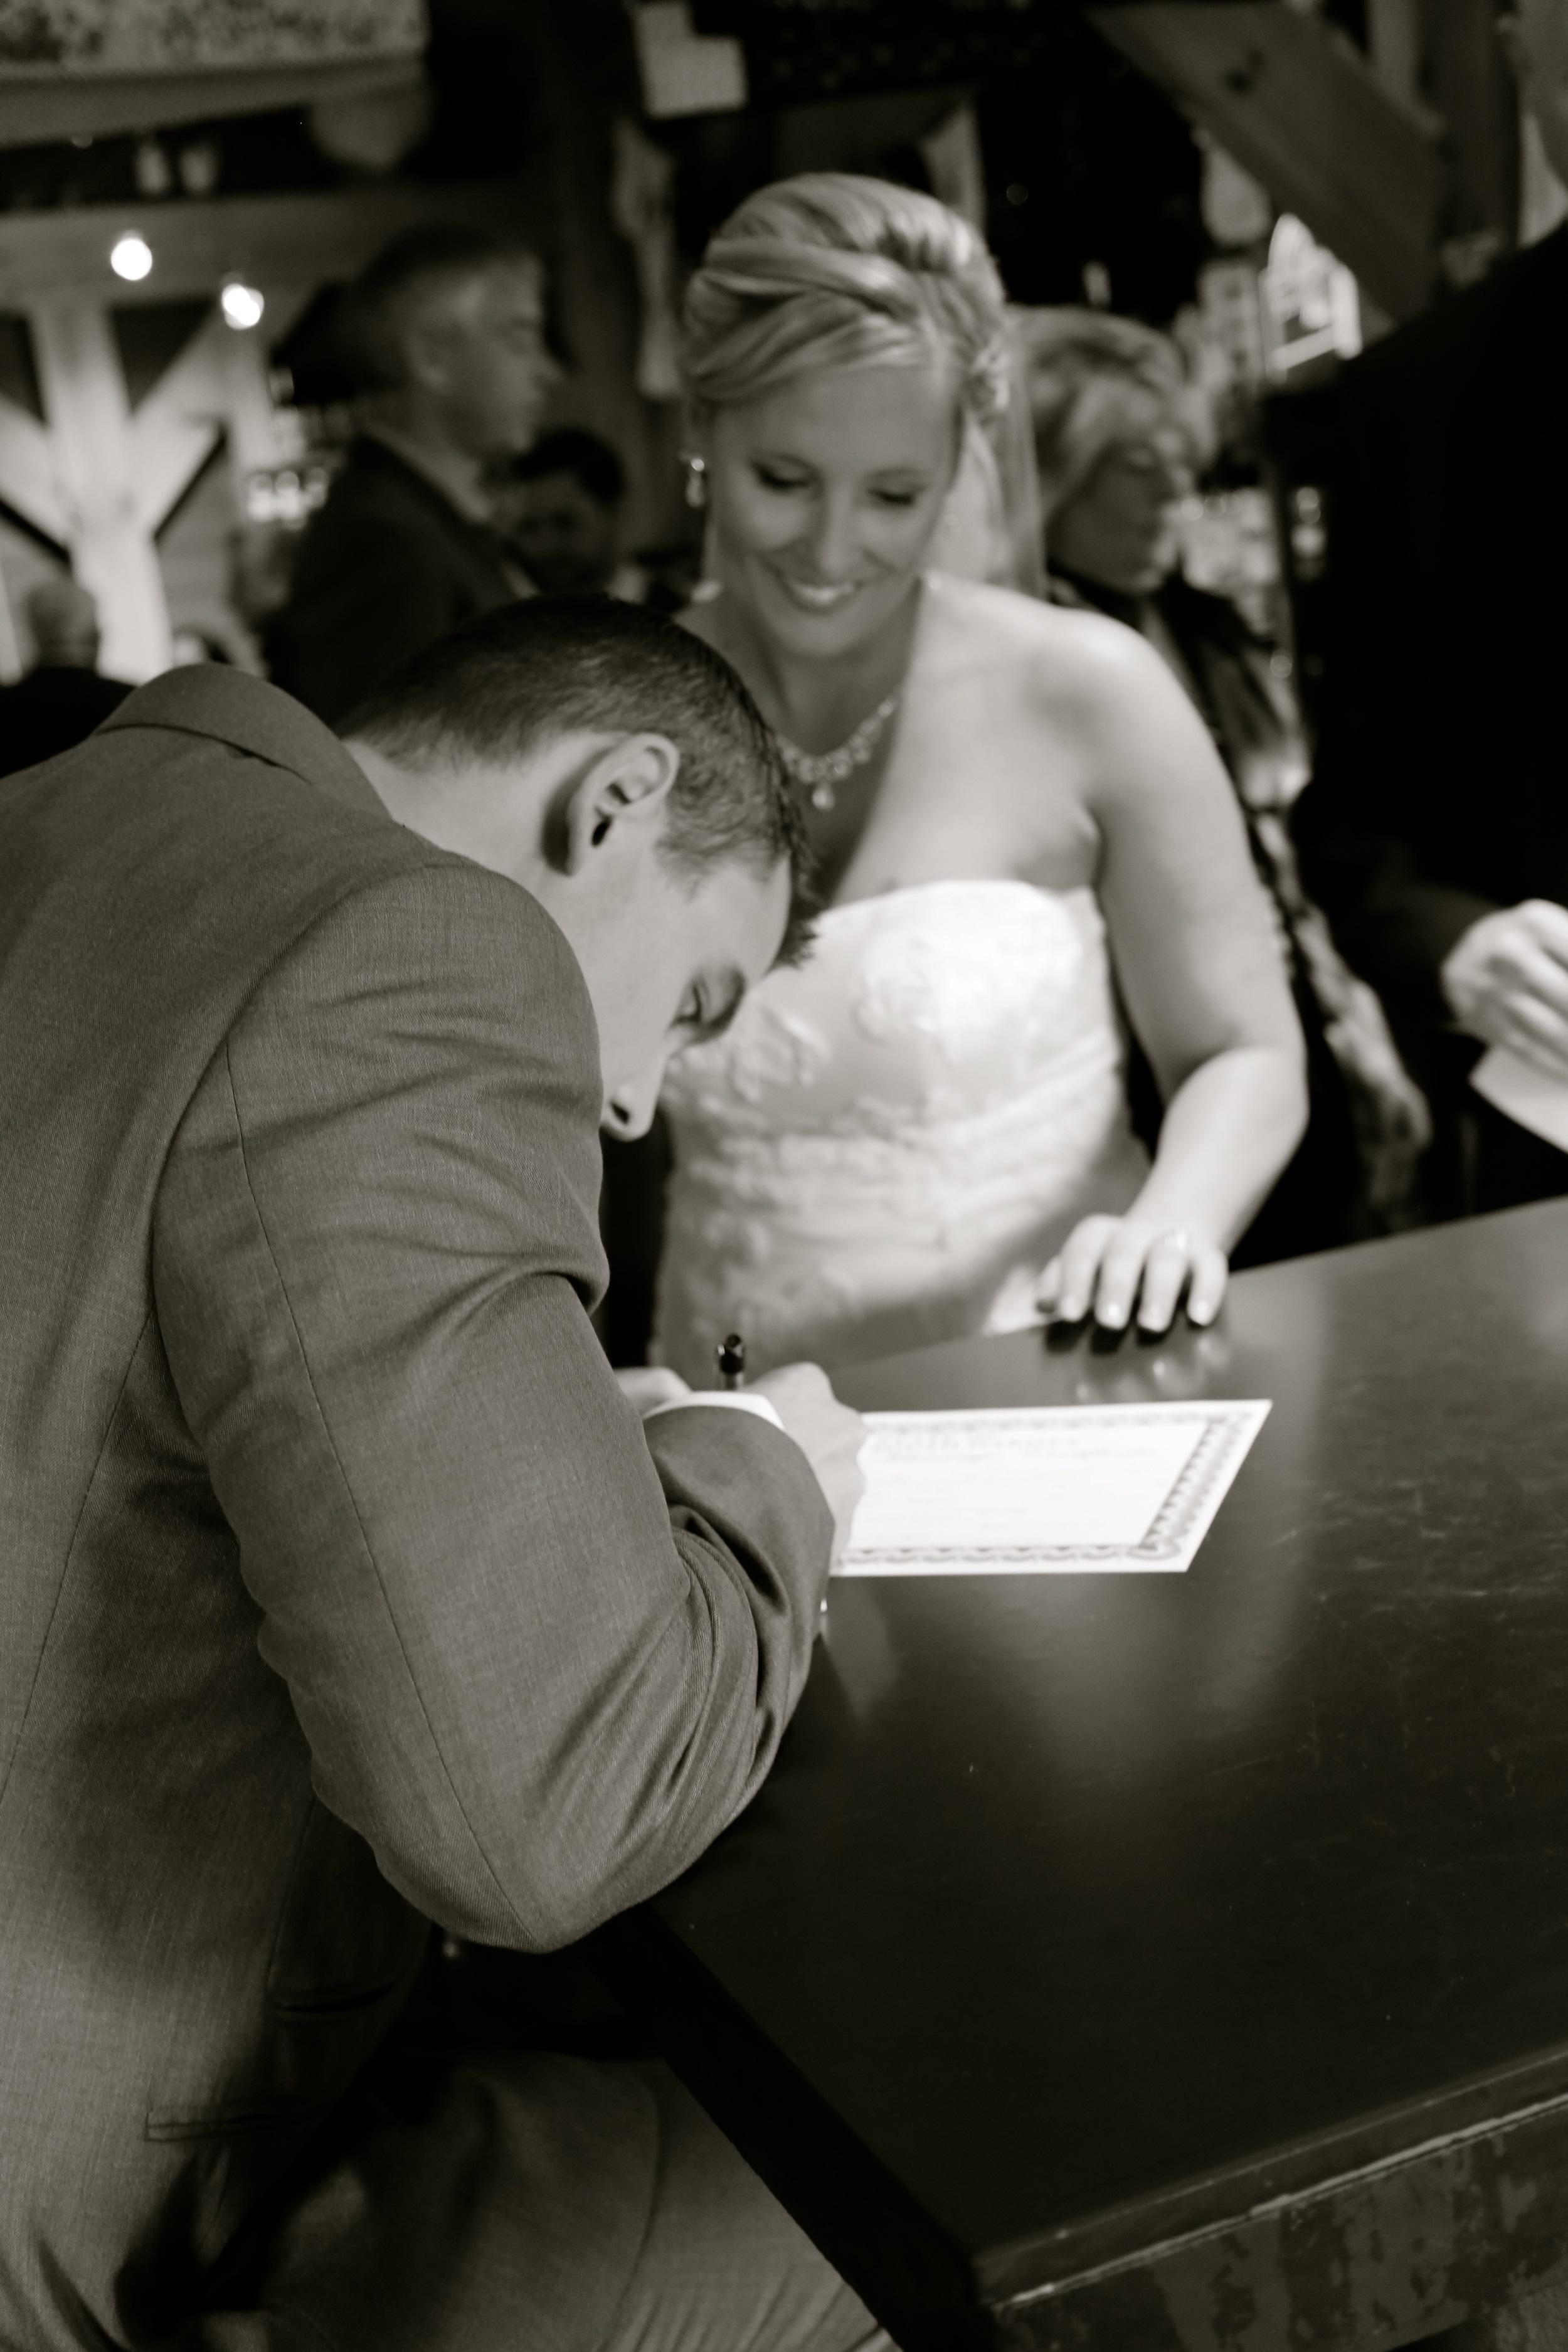 Erald Signing Brandi Watches.jpg